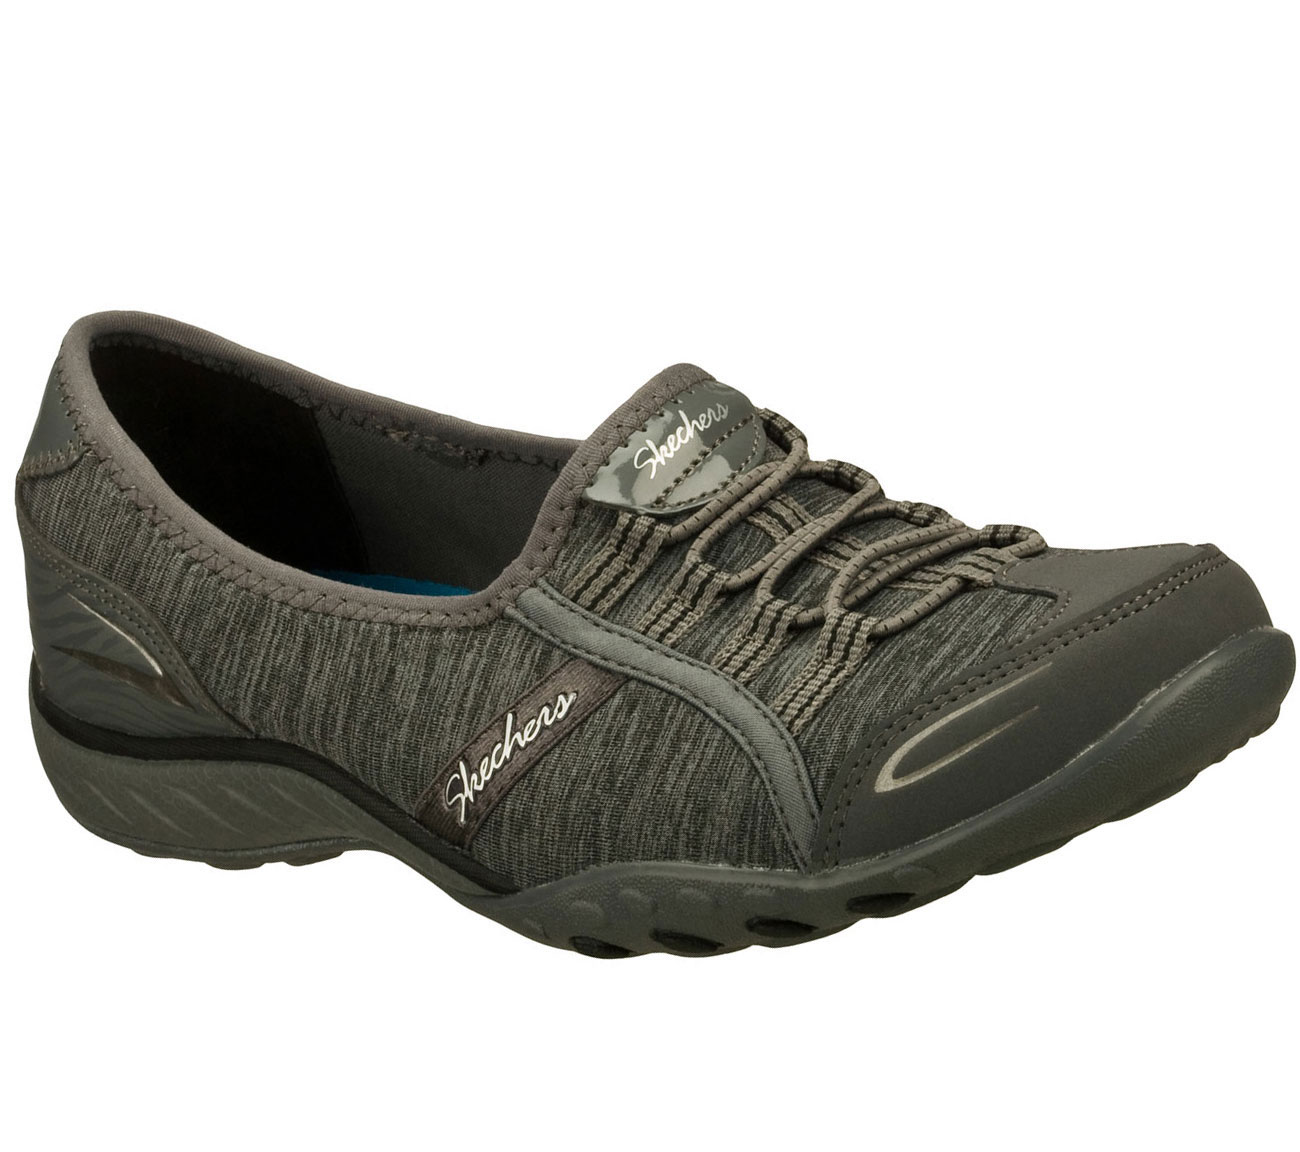 Skechers Womens Relaxed Fit Breathe Easy Good Life Memory Foam Shoe   Car Interior Design